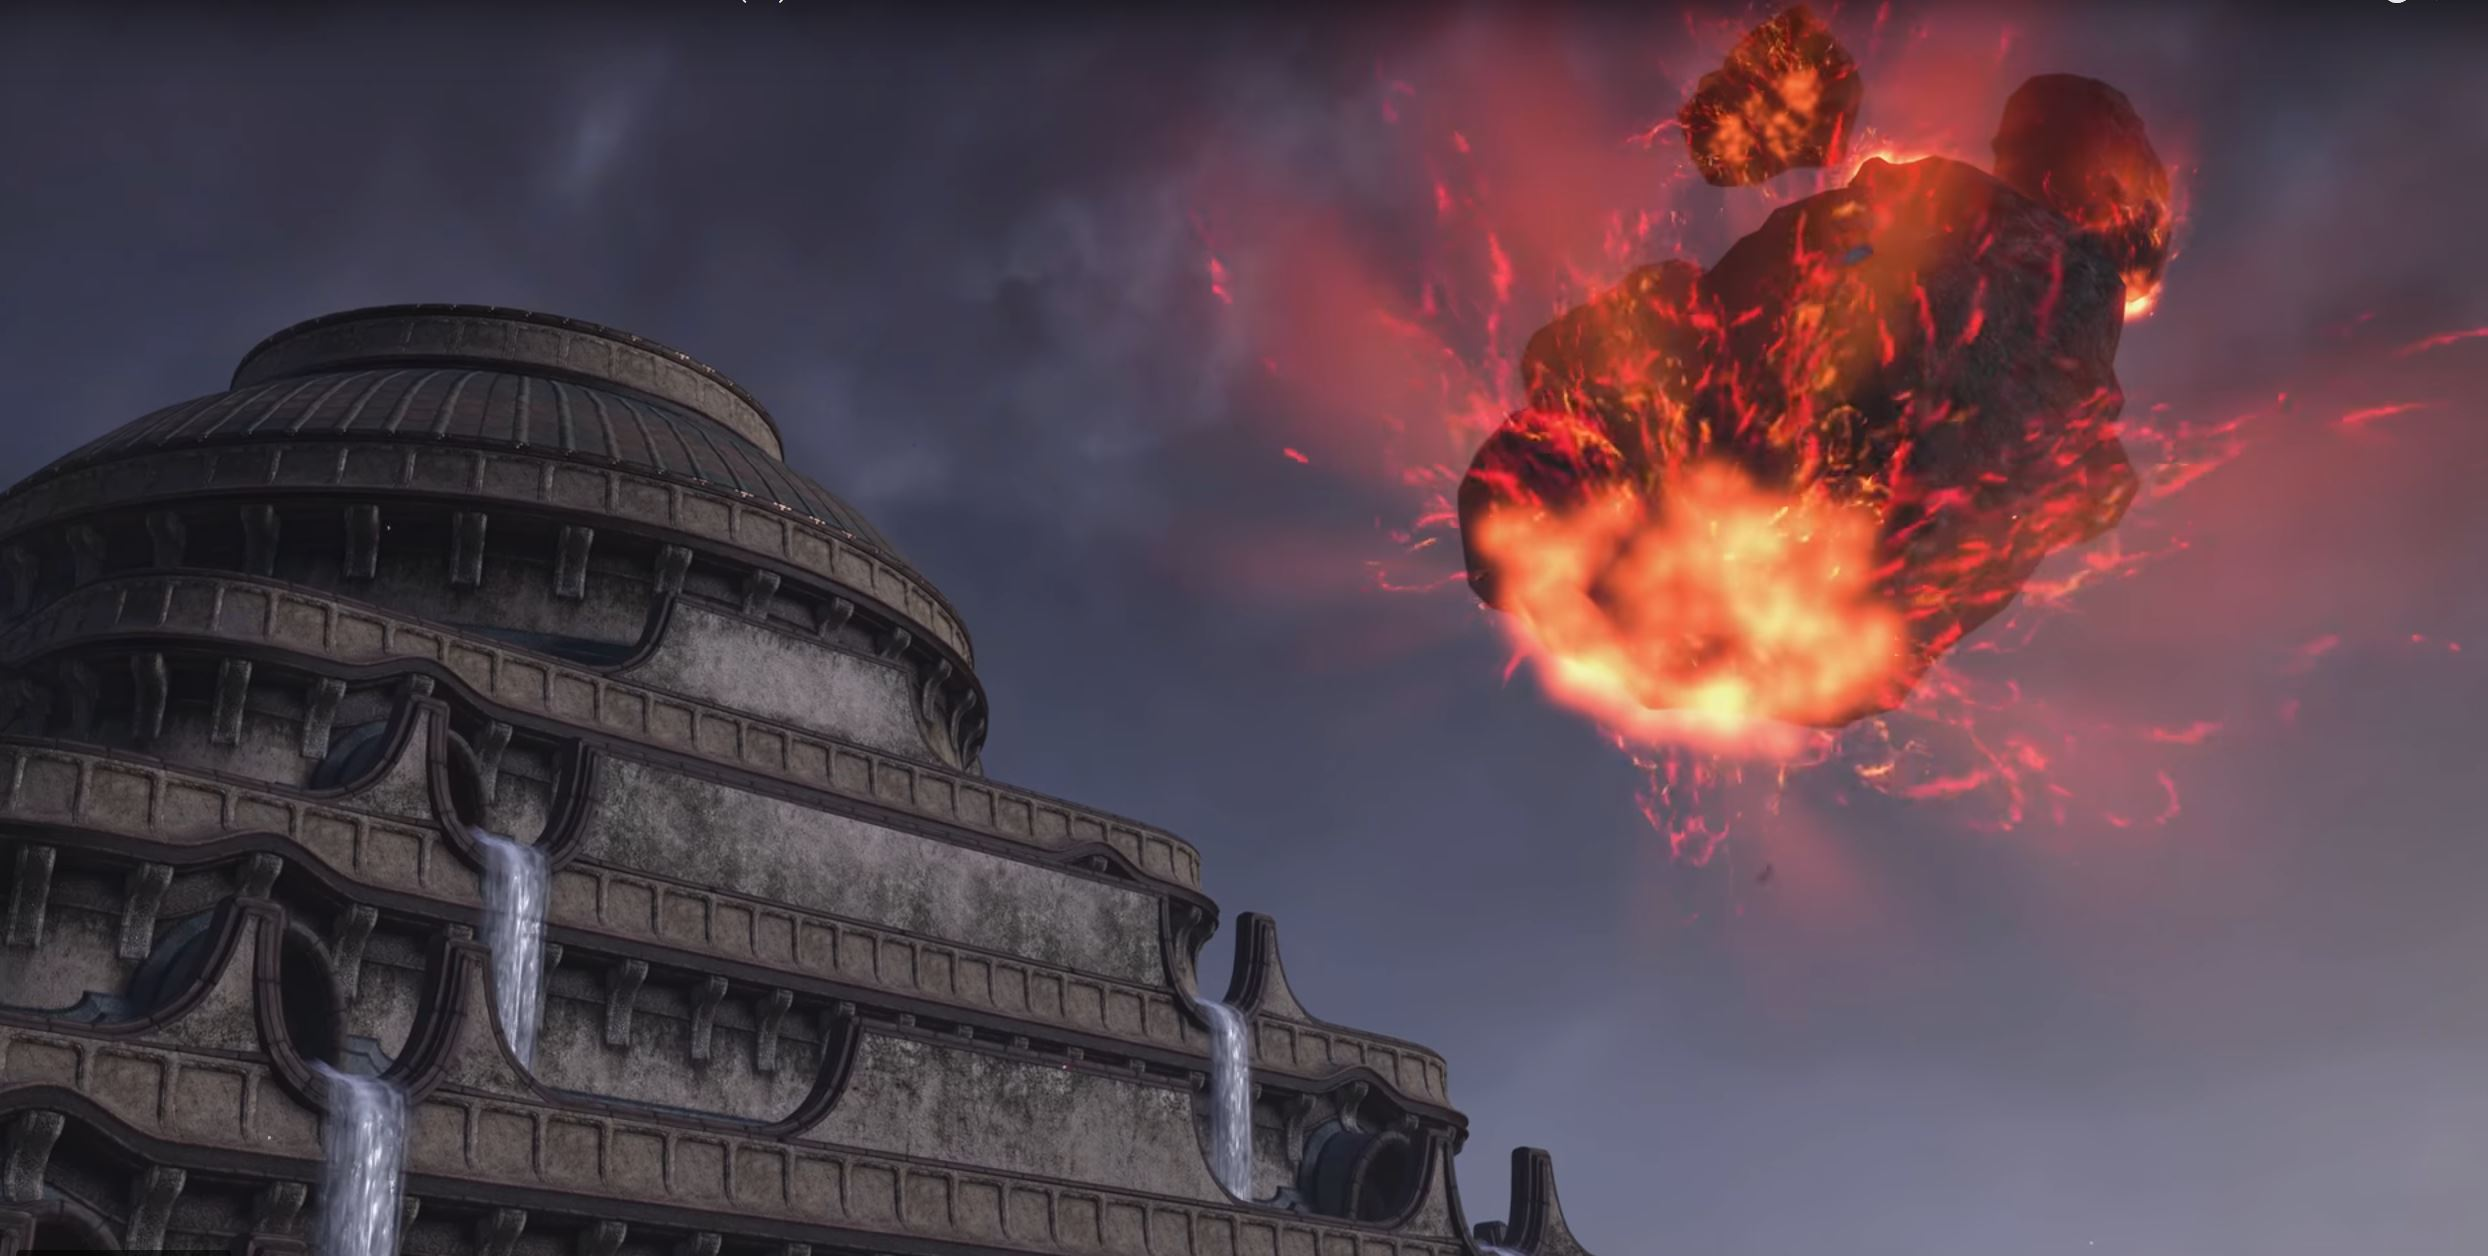 ESO Morrowind: Launch-Trailer zeigt den drohenden Untergang